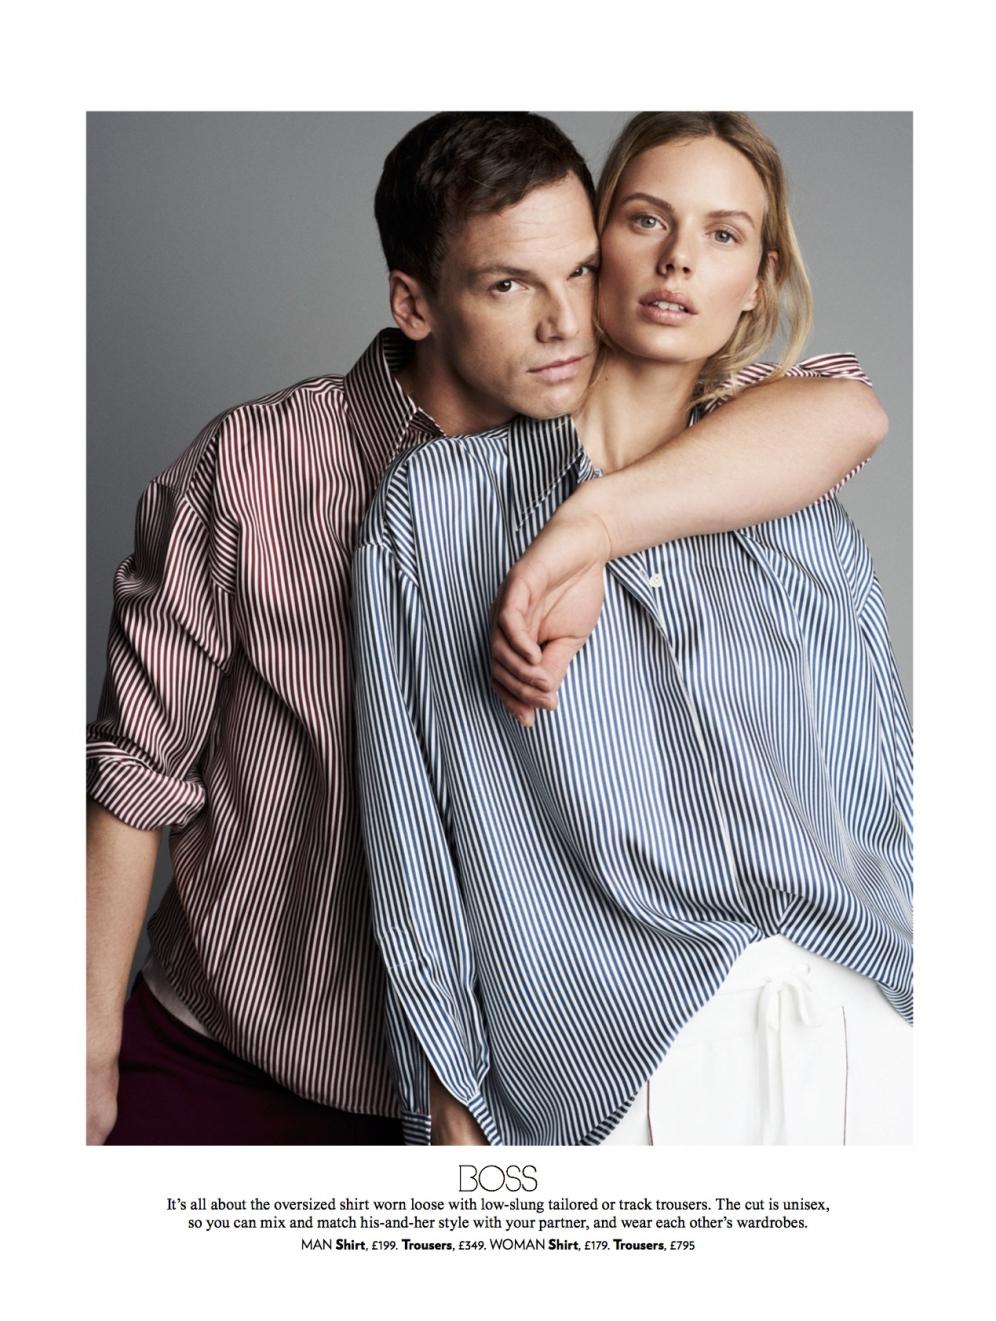 Boy Meets Girl | Red Magazine